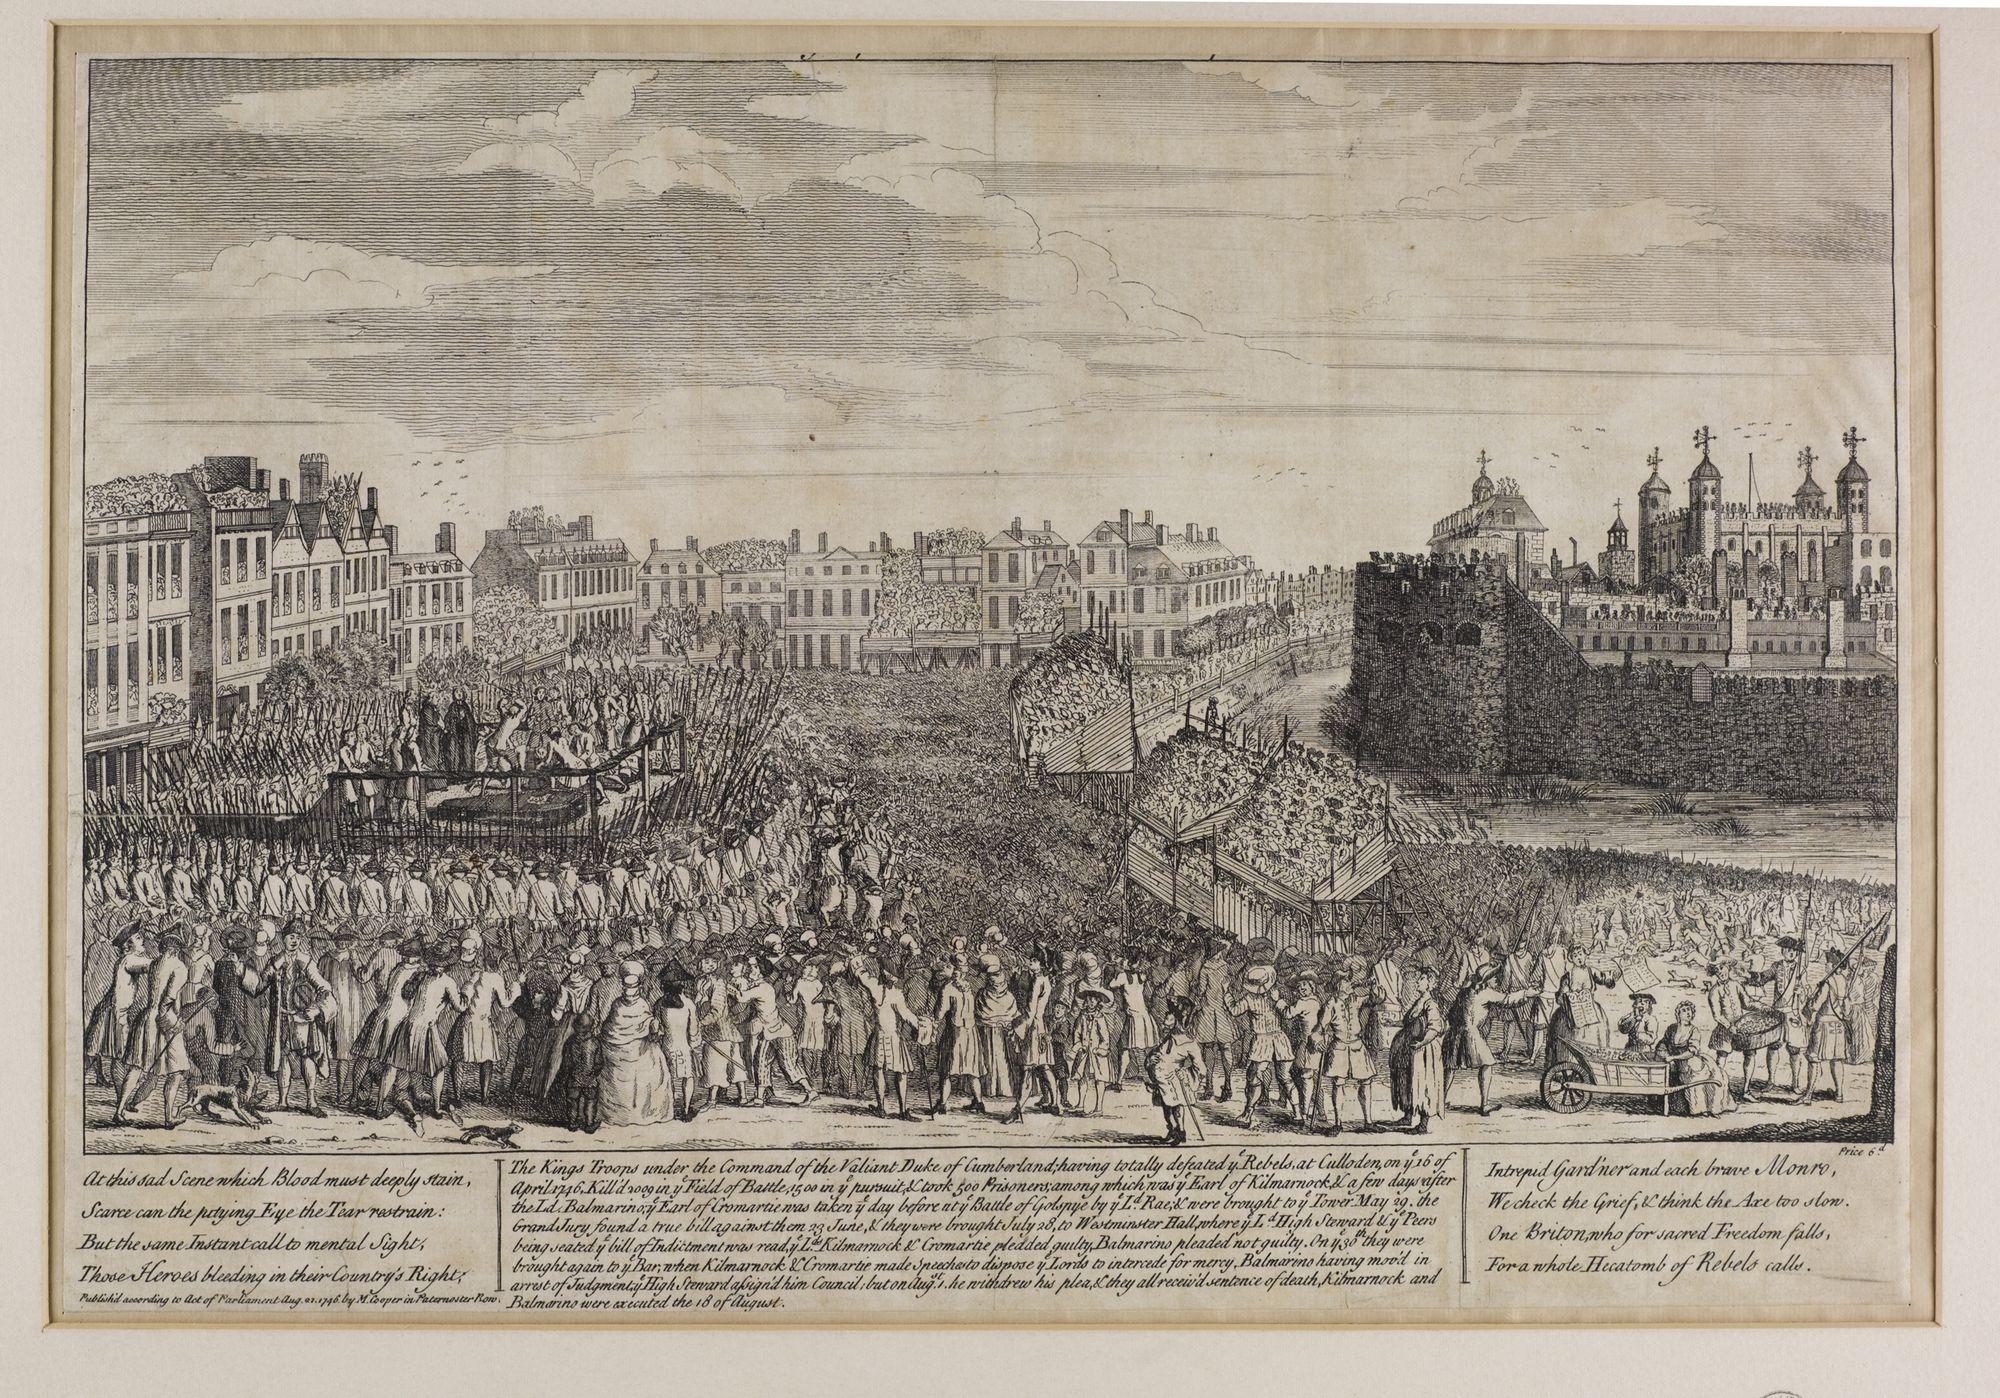 Execution of the Earl of Kilmarnock and Lord Balmerino: National Library of Scotland